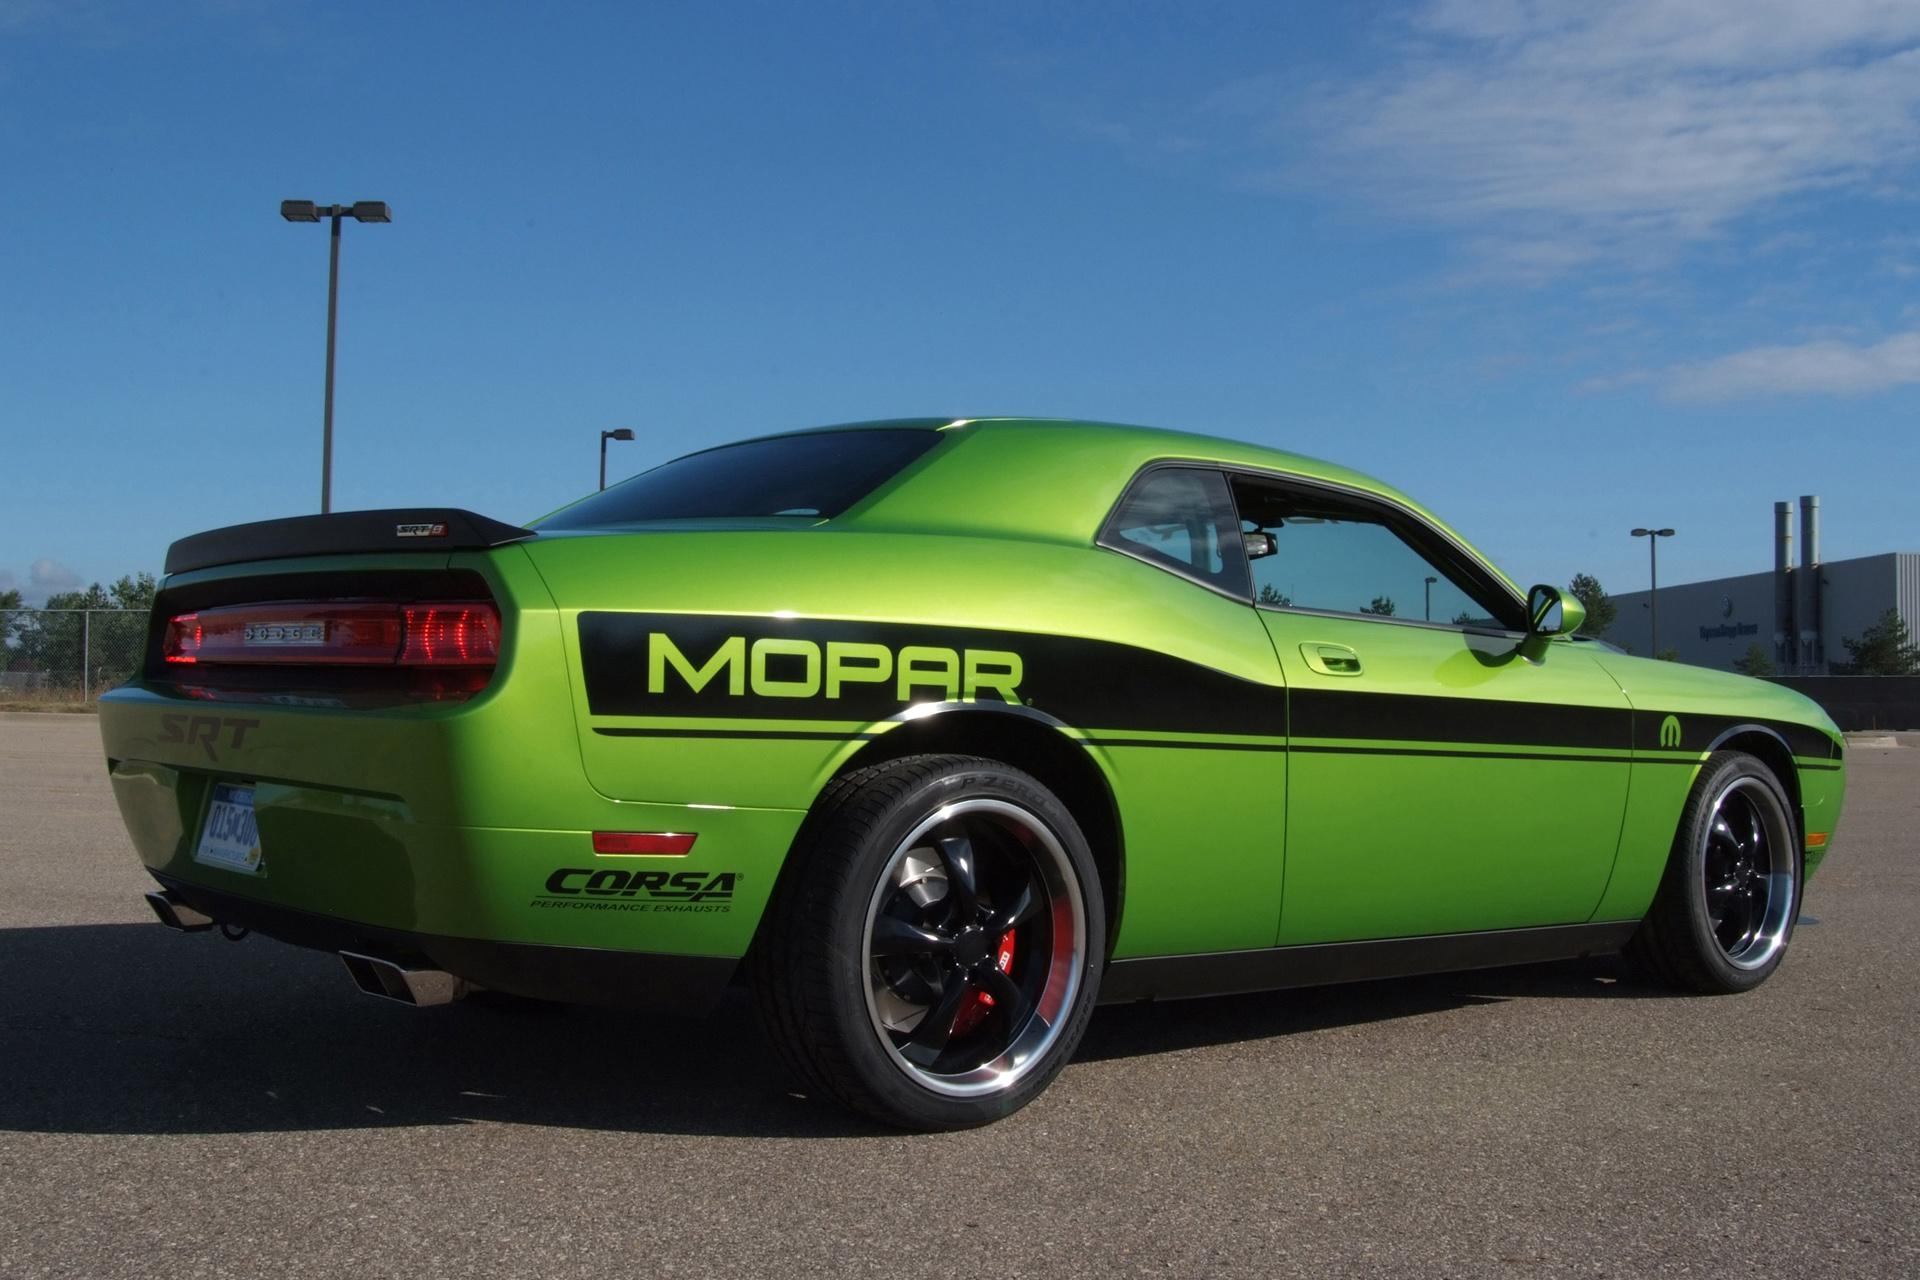 Mopar Dodge Challenger Targa picture #68487 | Mopar photo gallery ...